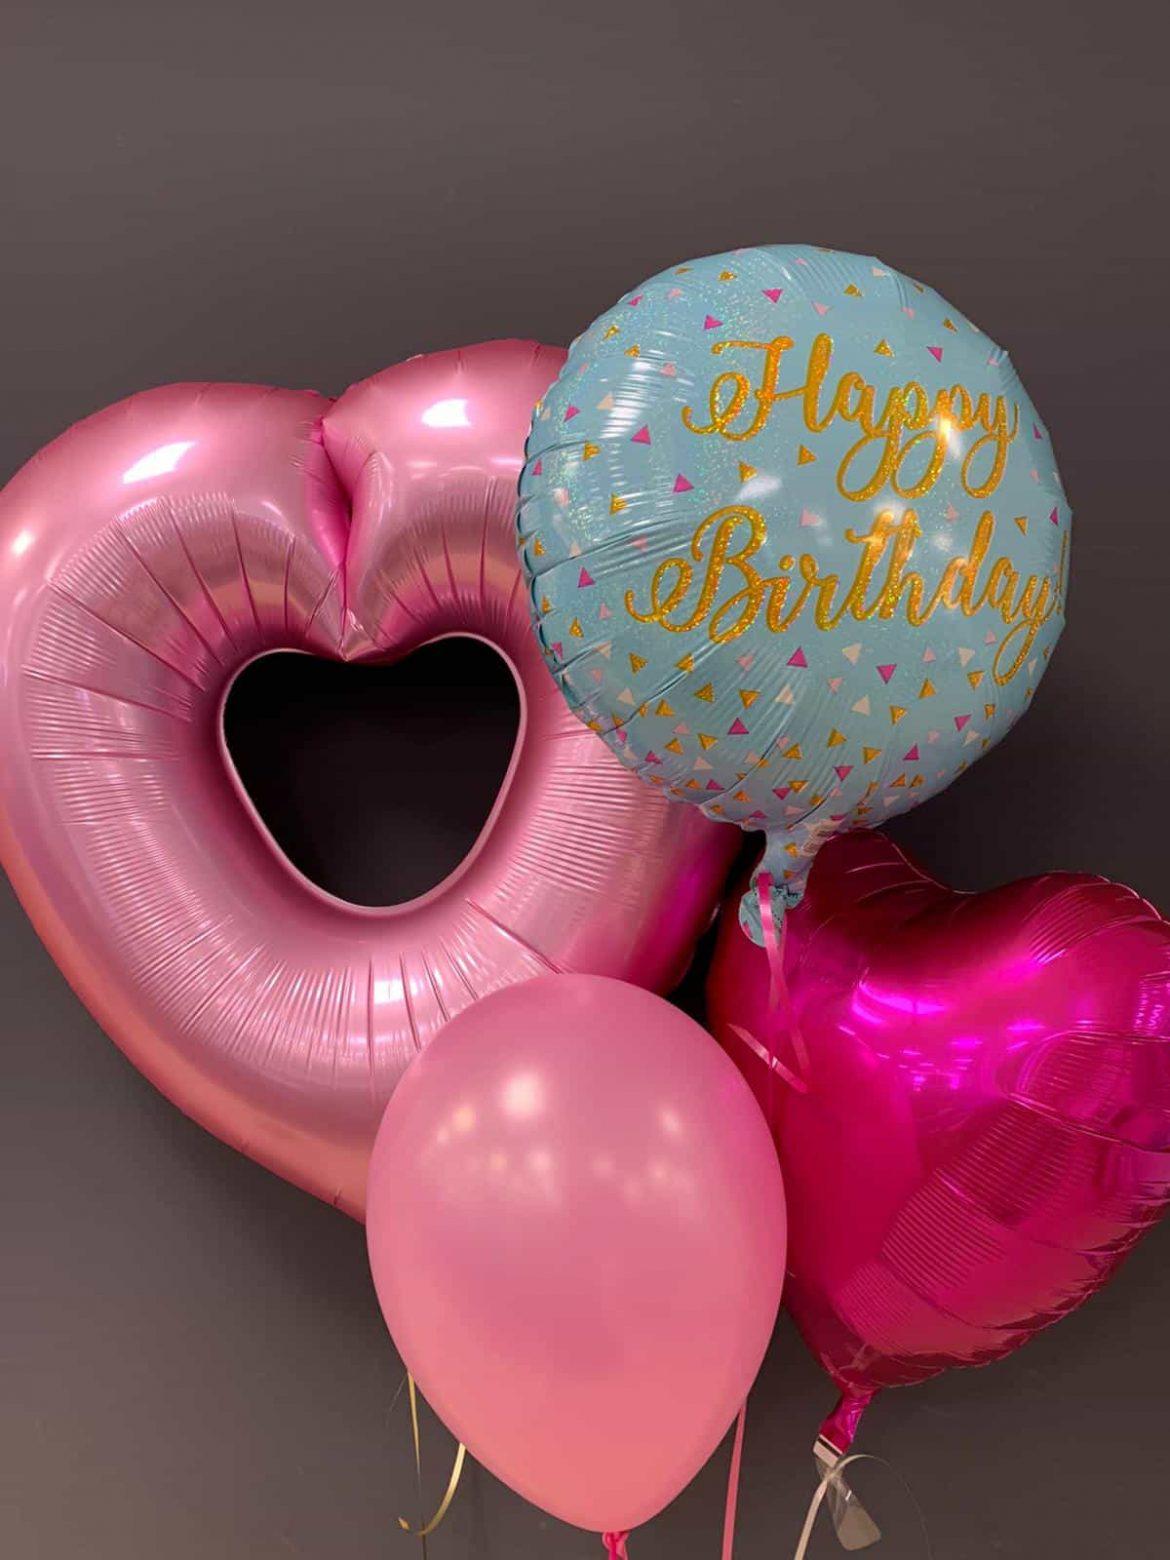 Happy Birthday € 5,50 <br />grosses Herz € 7,90 1